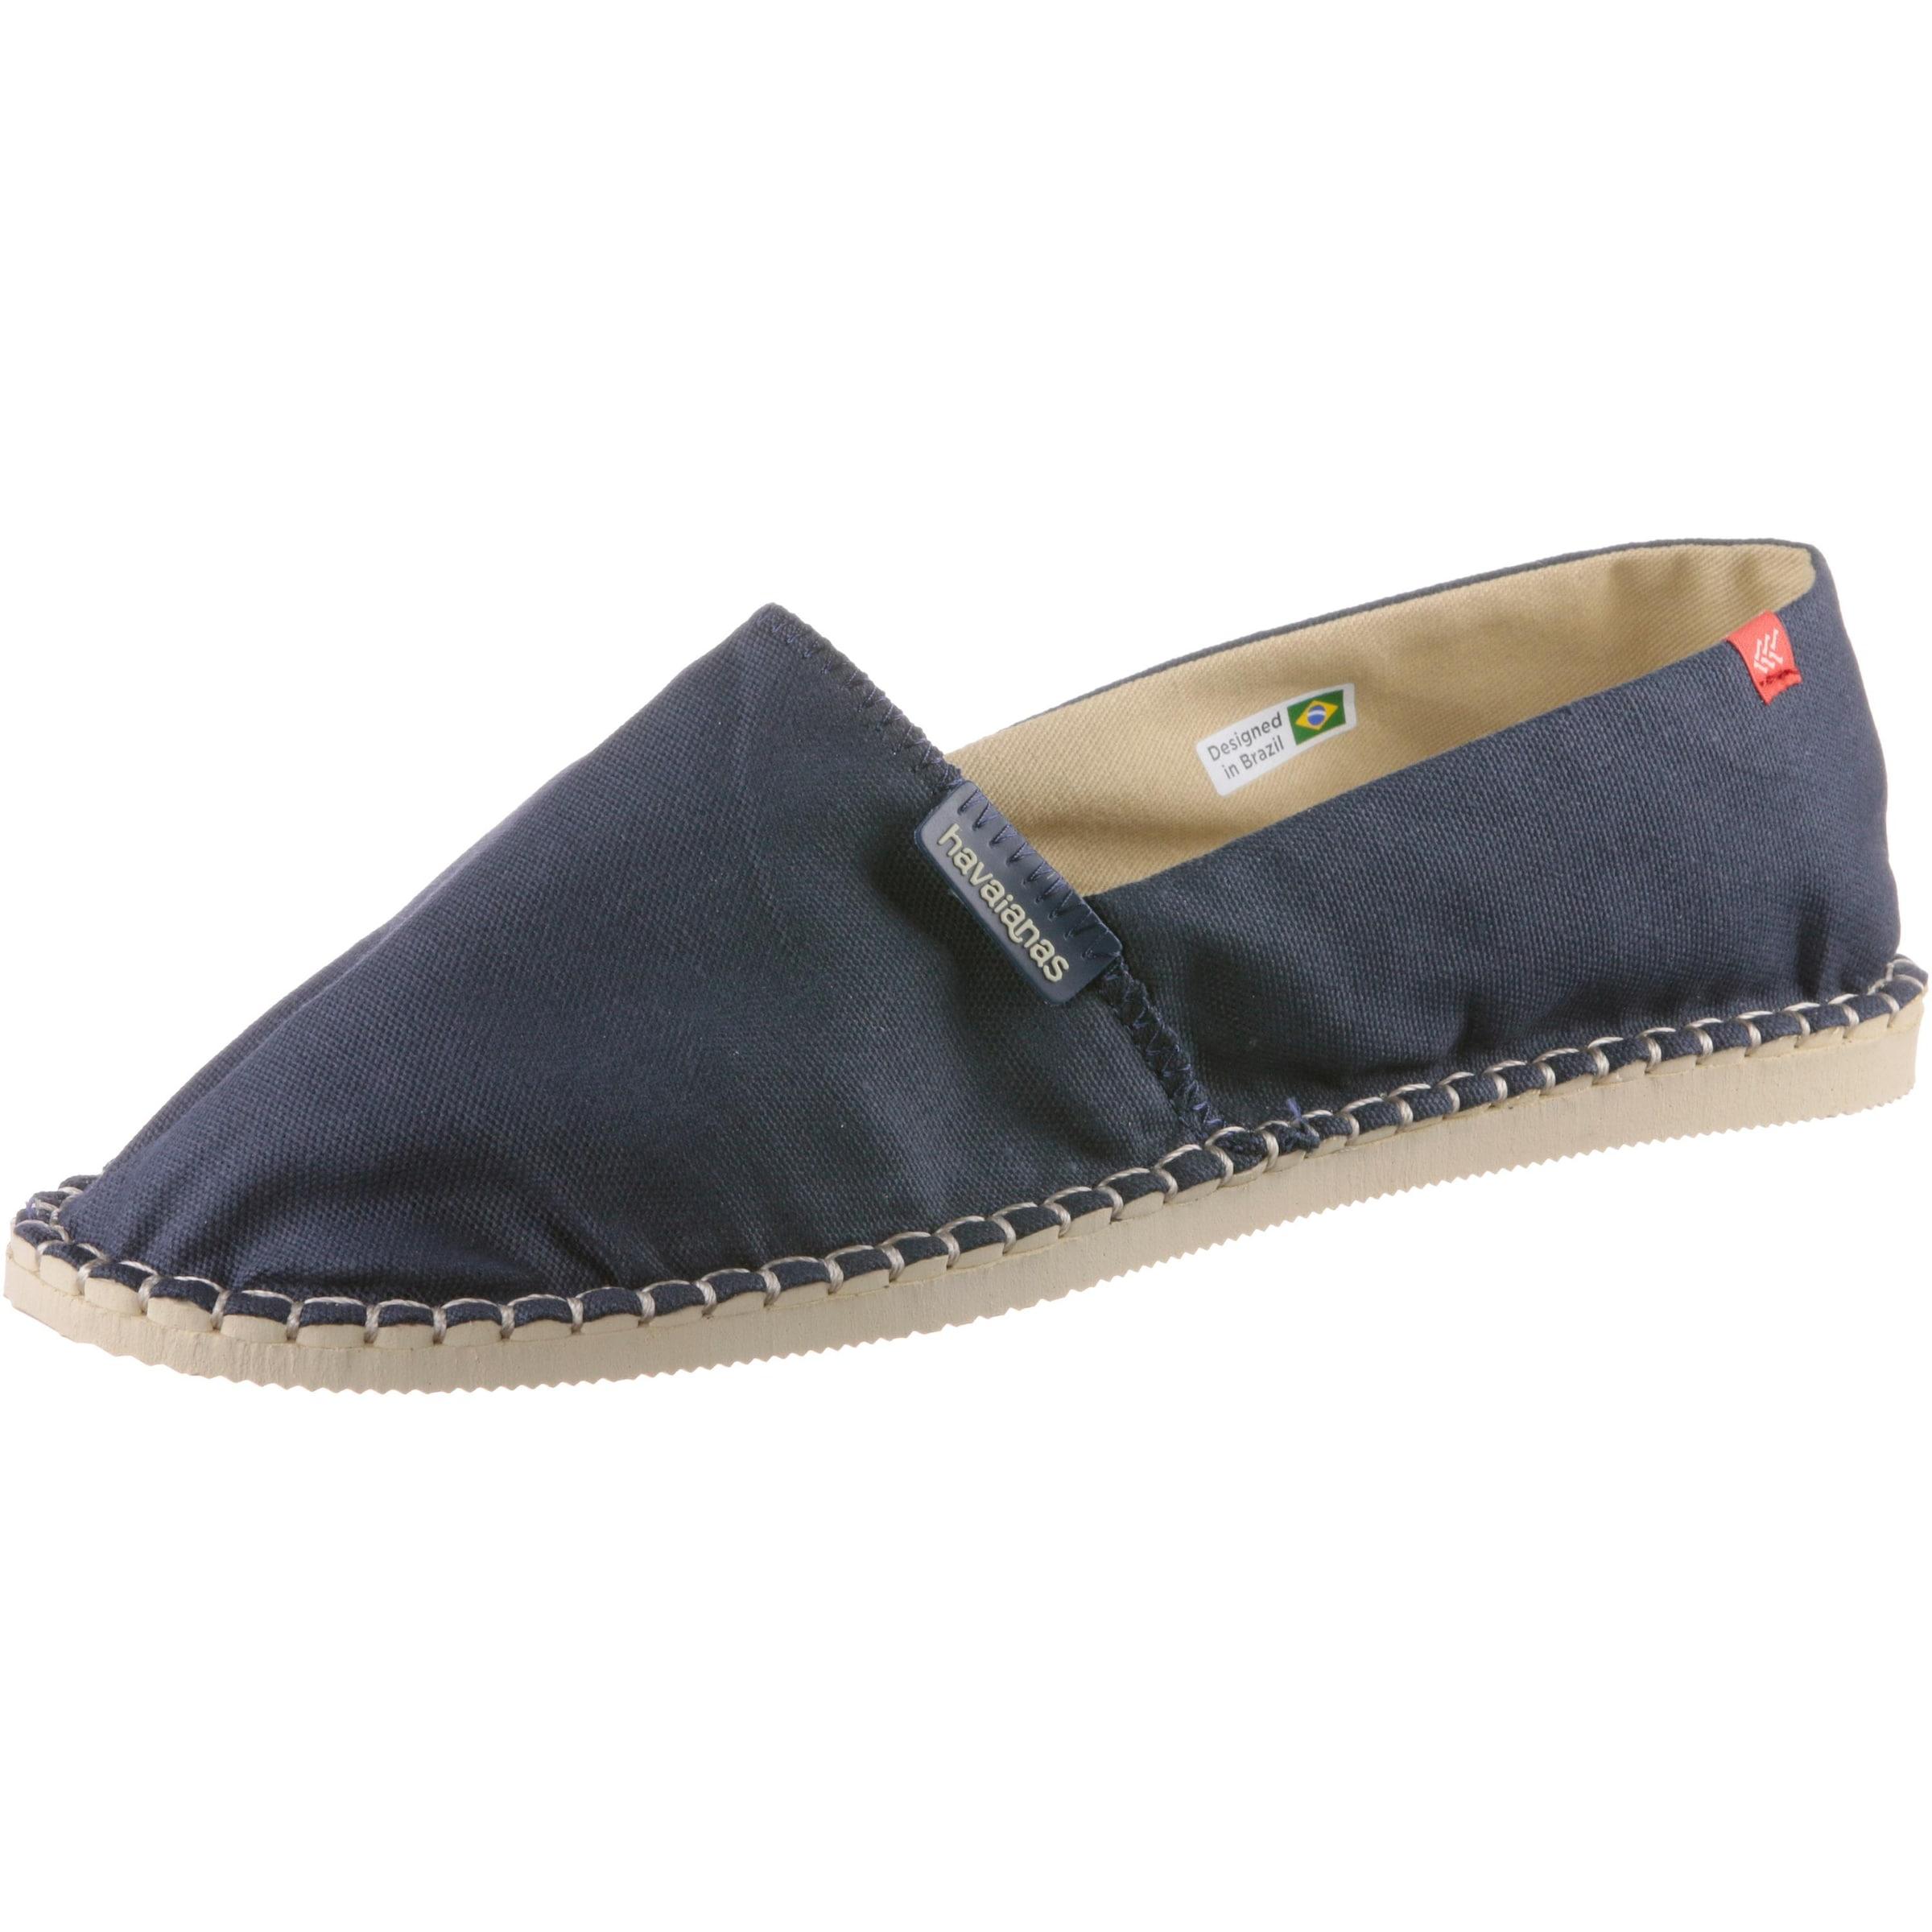 Haltbare Mode billige Schuhe HAVAIANAS   Espandrillos Herren Schuhe Gut getragene Schuhe